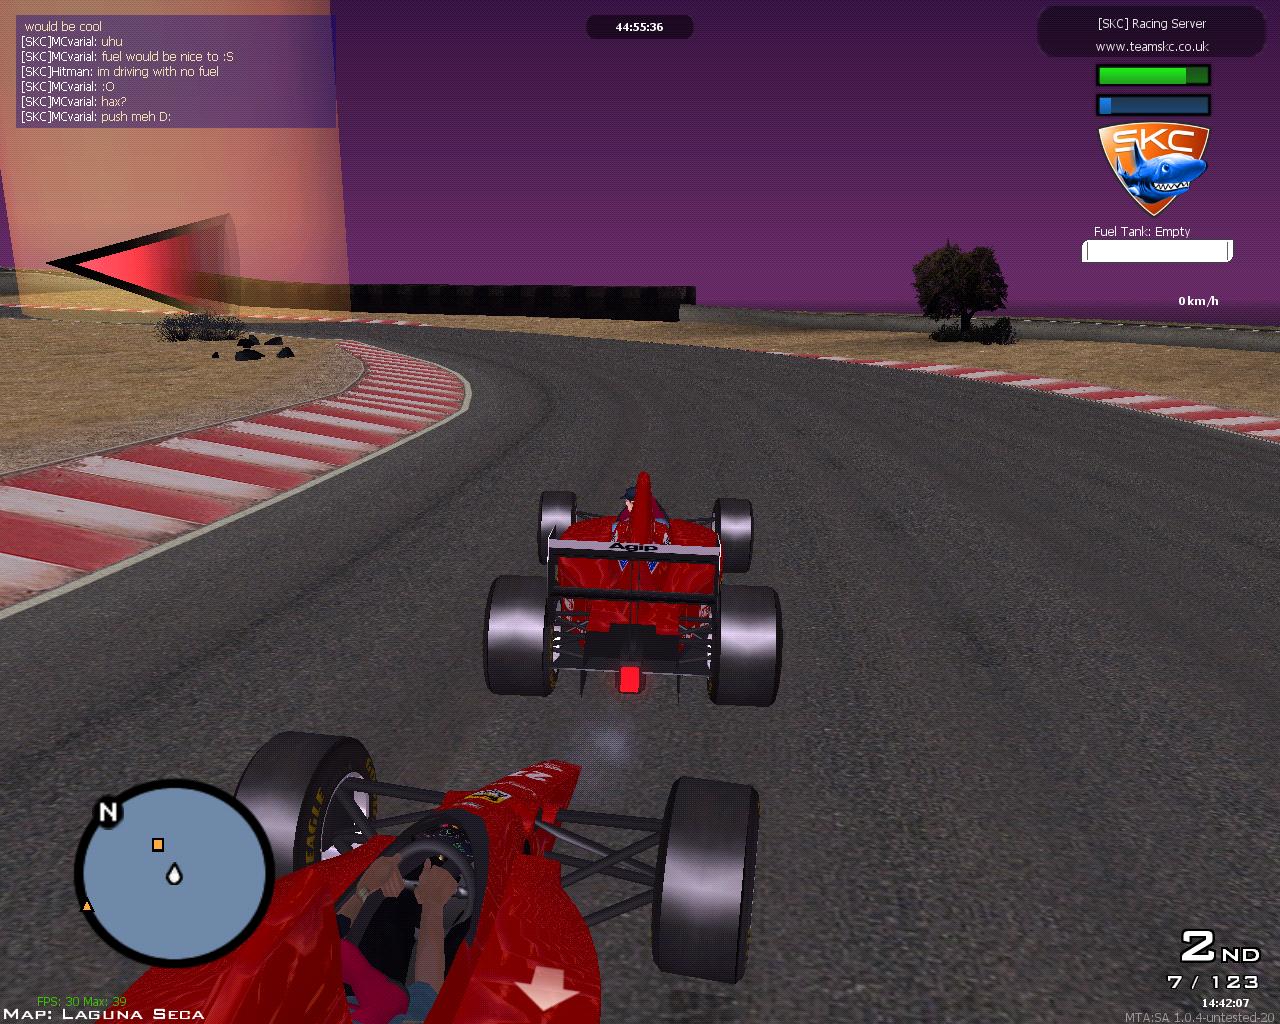 Laguna Seca Raceway >> Custom models (F1 track) image - Multi Theft Auto: San Andreas mod for Grand Theft Auto: San ...